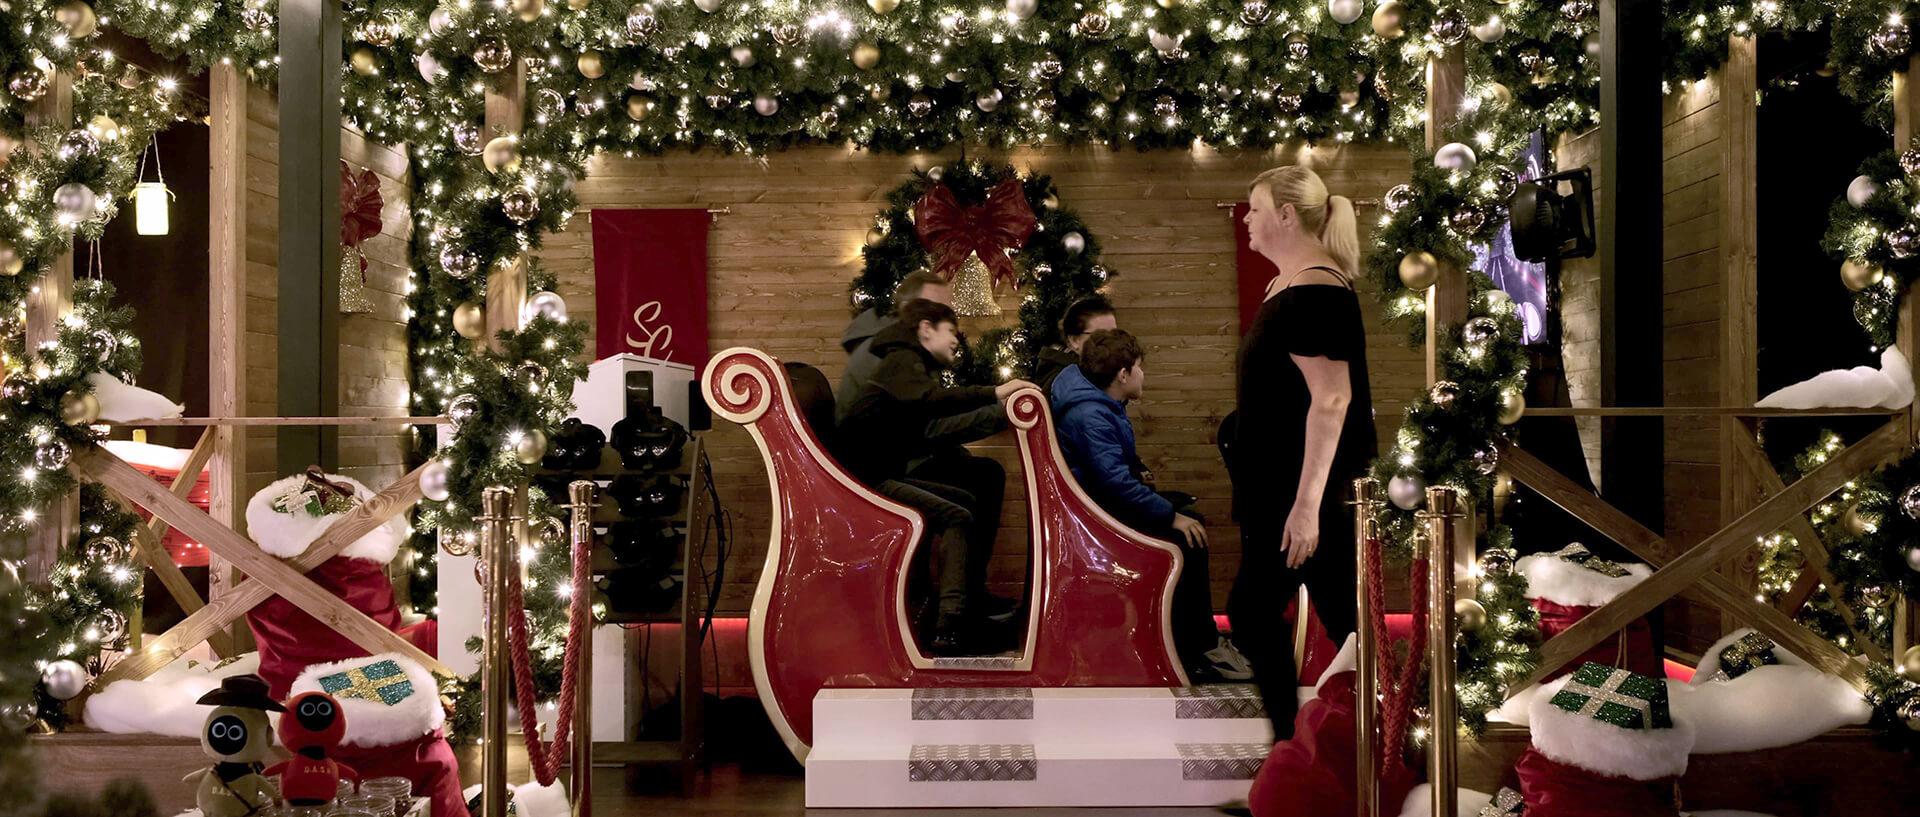 vr-sleigh-ride-2